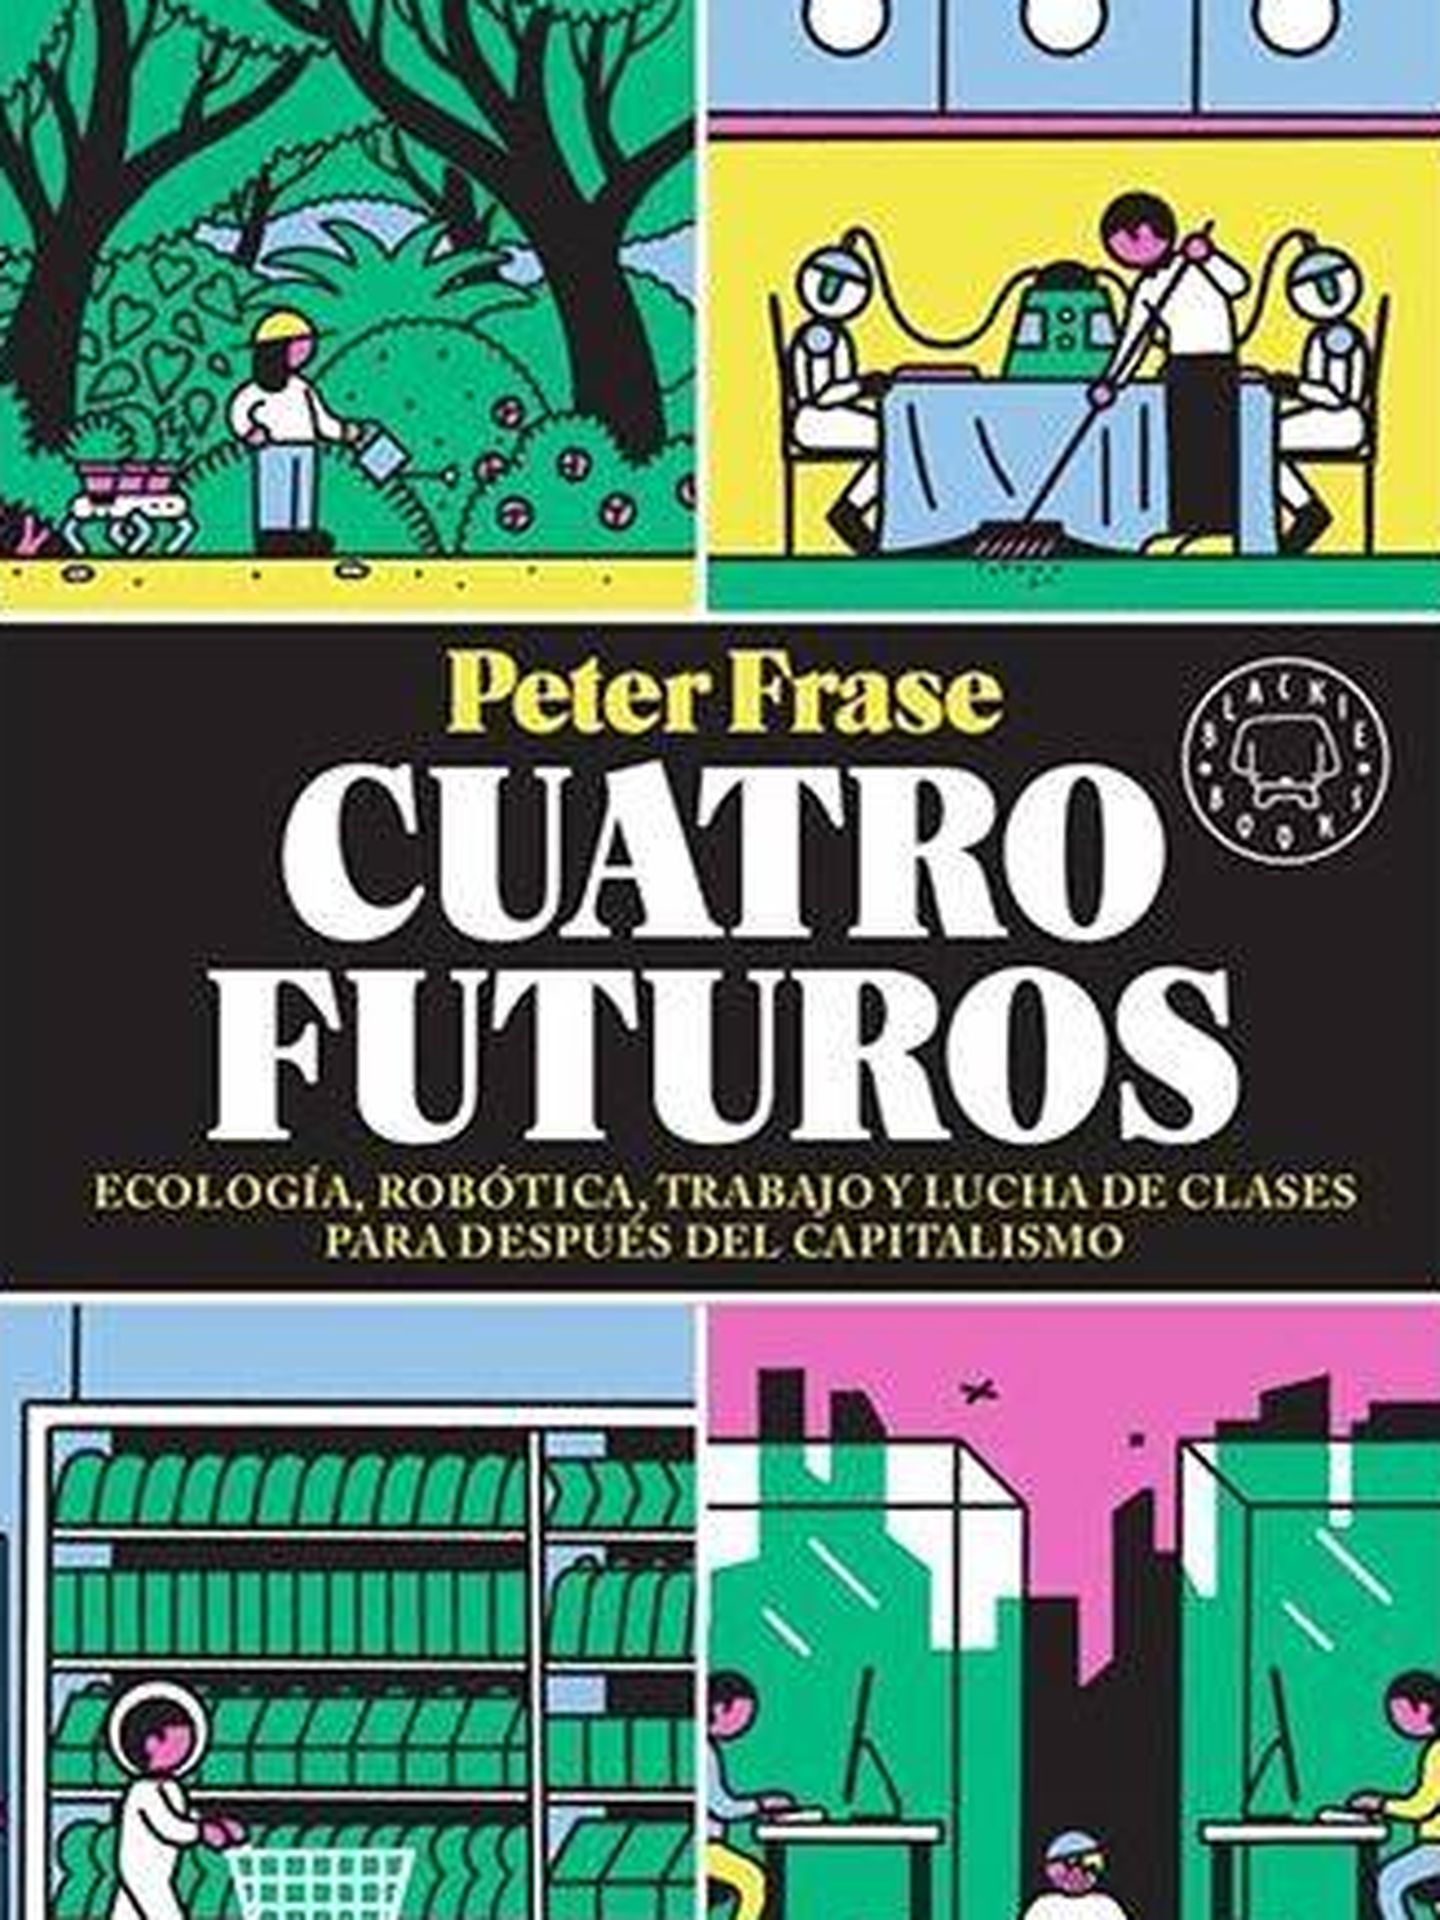 'Cuatro futuros' (Blackie Books).